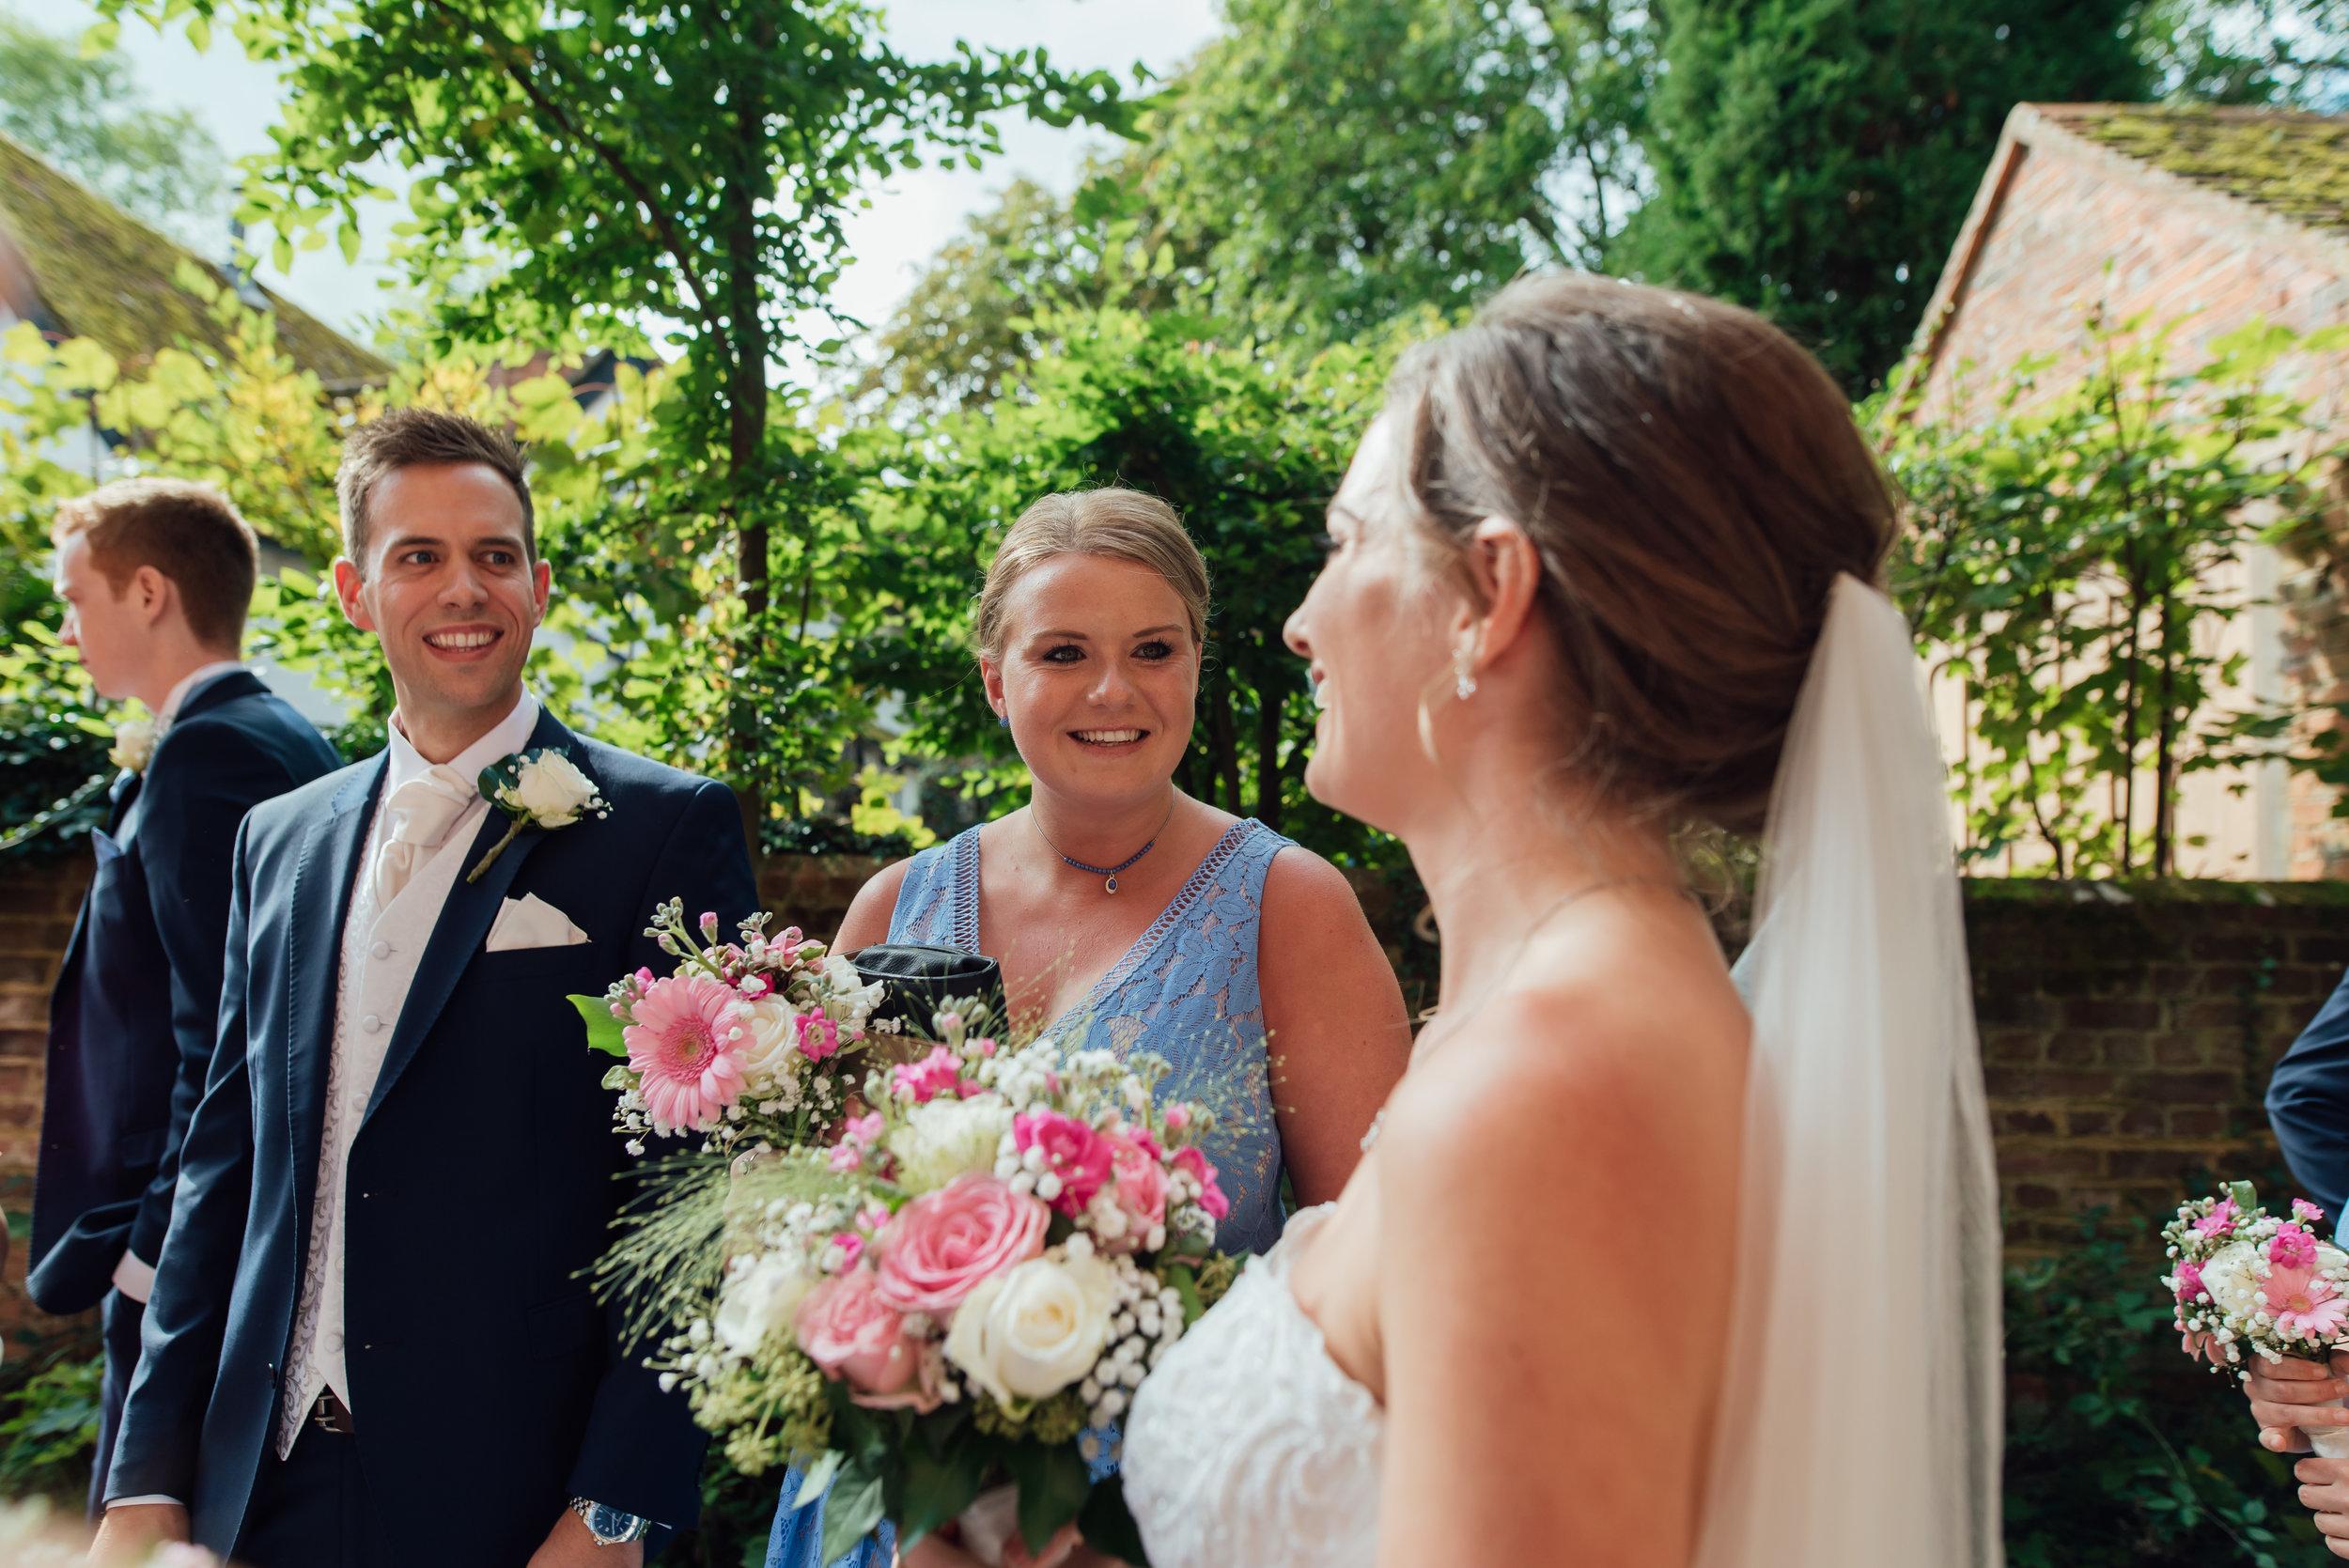 rotherwick-village-hall-wedding / Hampshire-wedding-photographer-hampshire / Amy-jmaes-photography / fleet-photographer